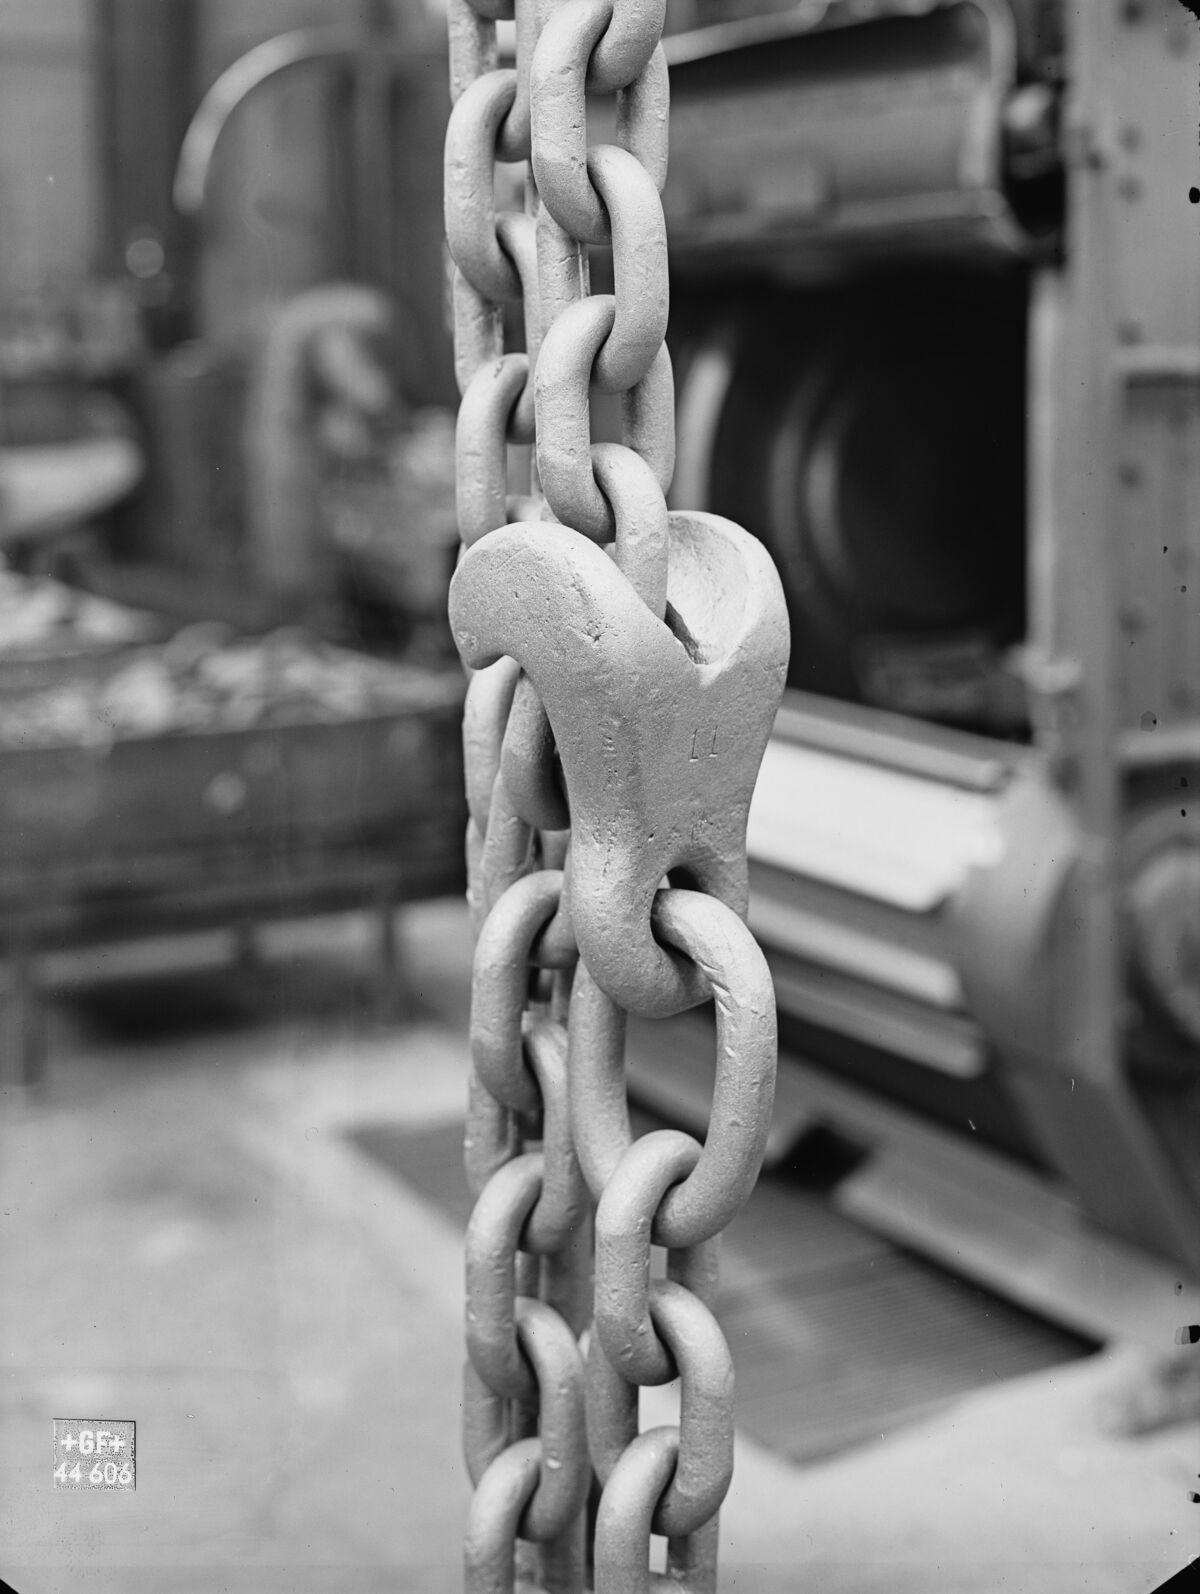 GFA 16/44606: Burden chain